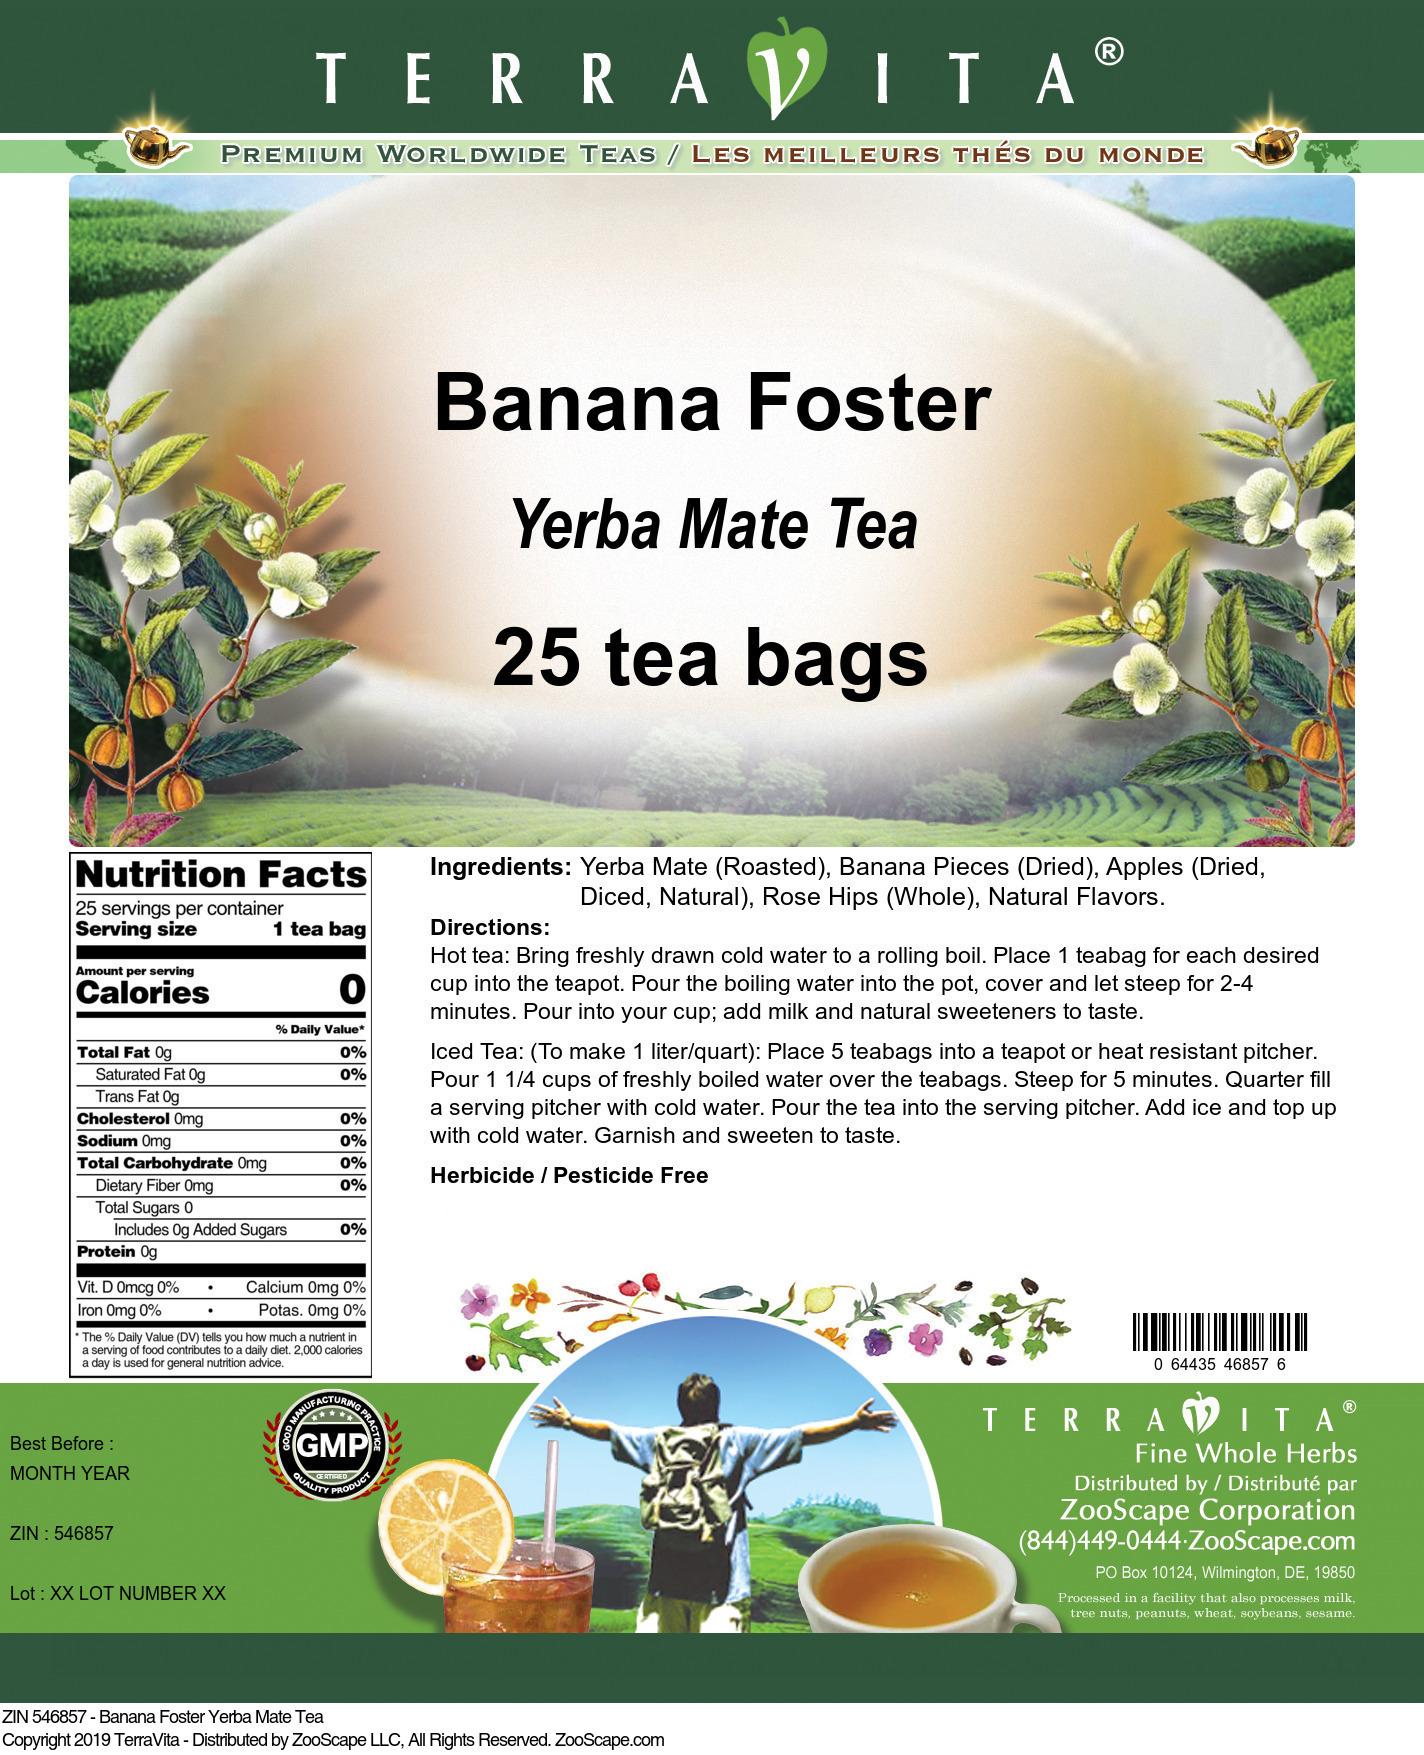 Banana Foster Yerba Mate Tea